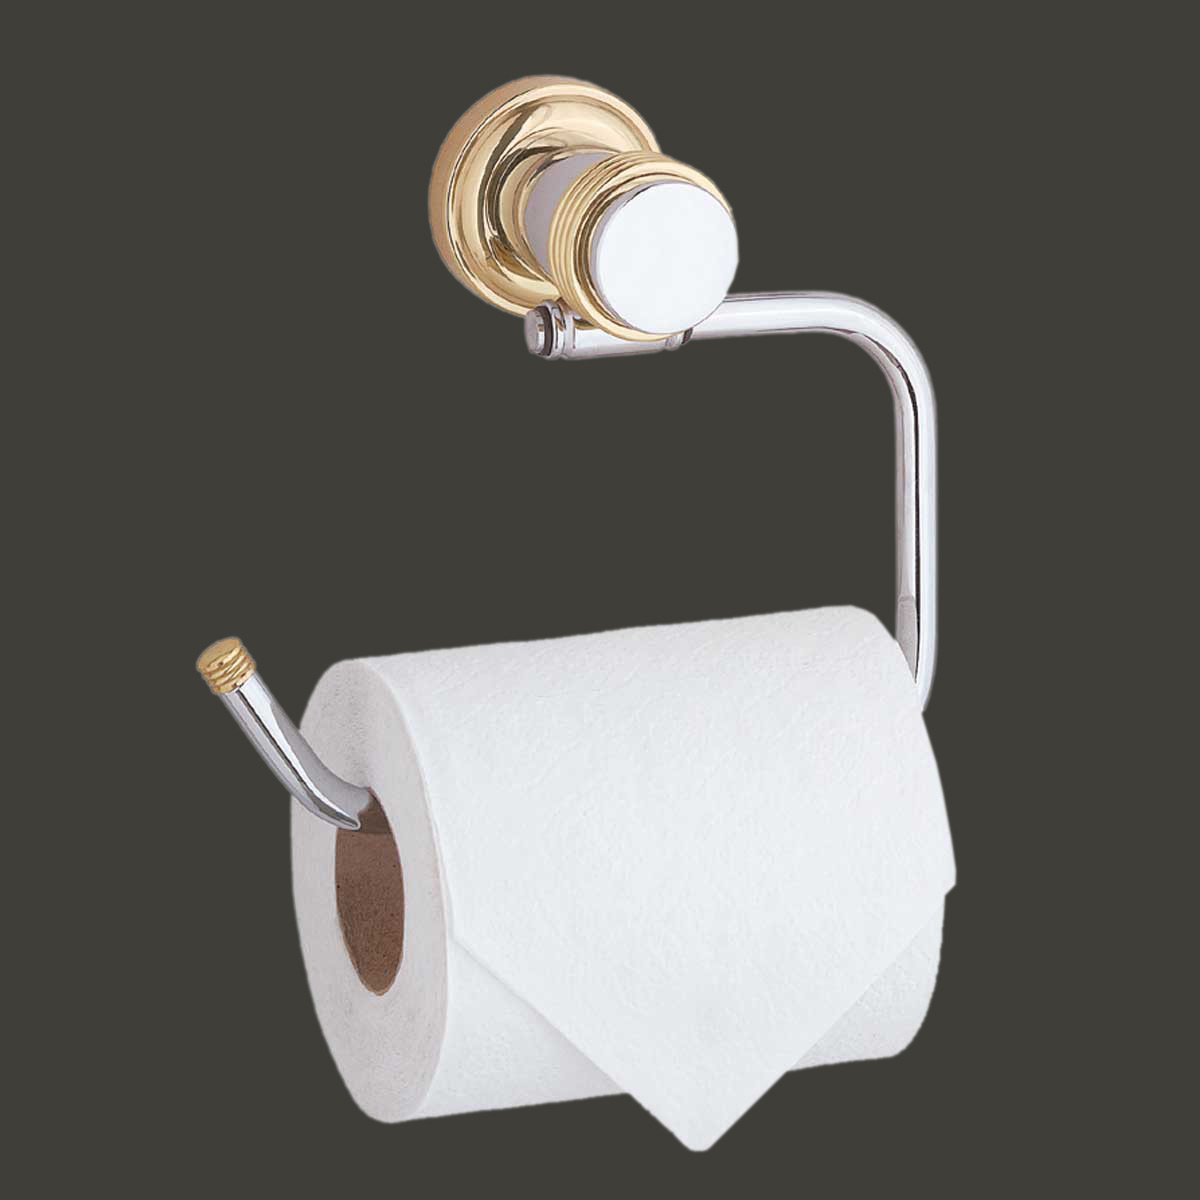 Victorian Toilet Paper Holder Stand Bright Chrome Tissue